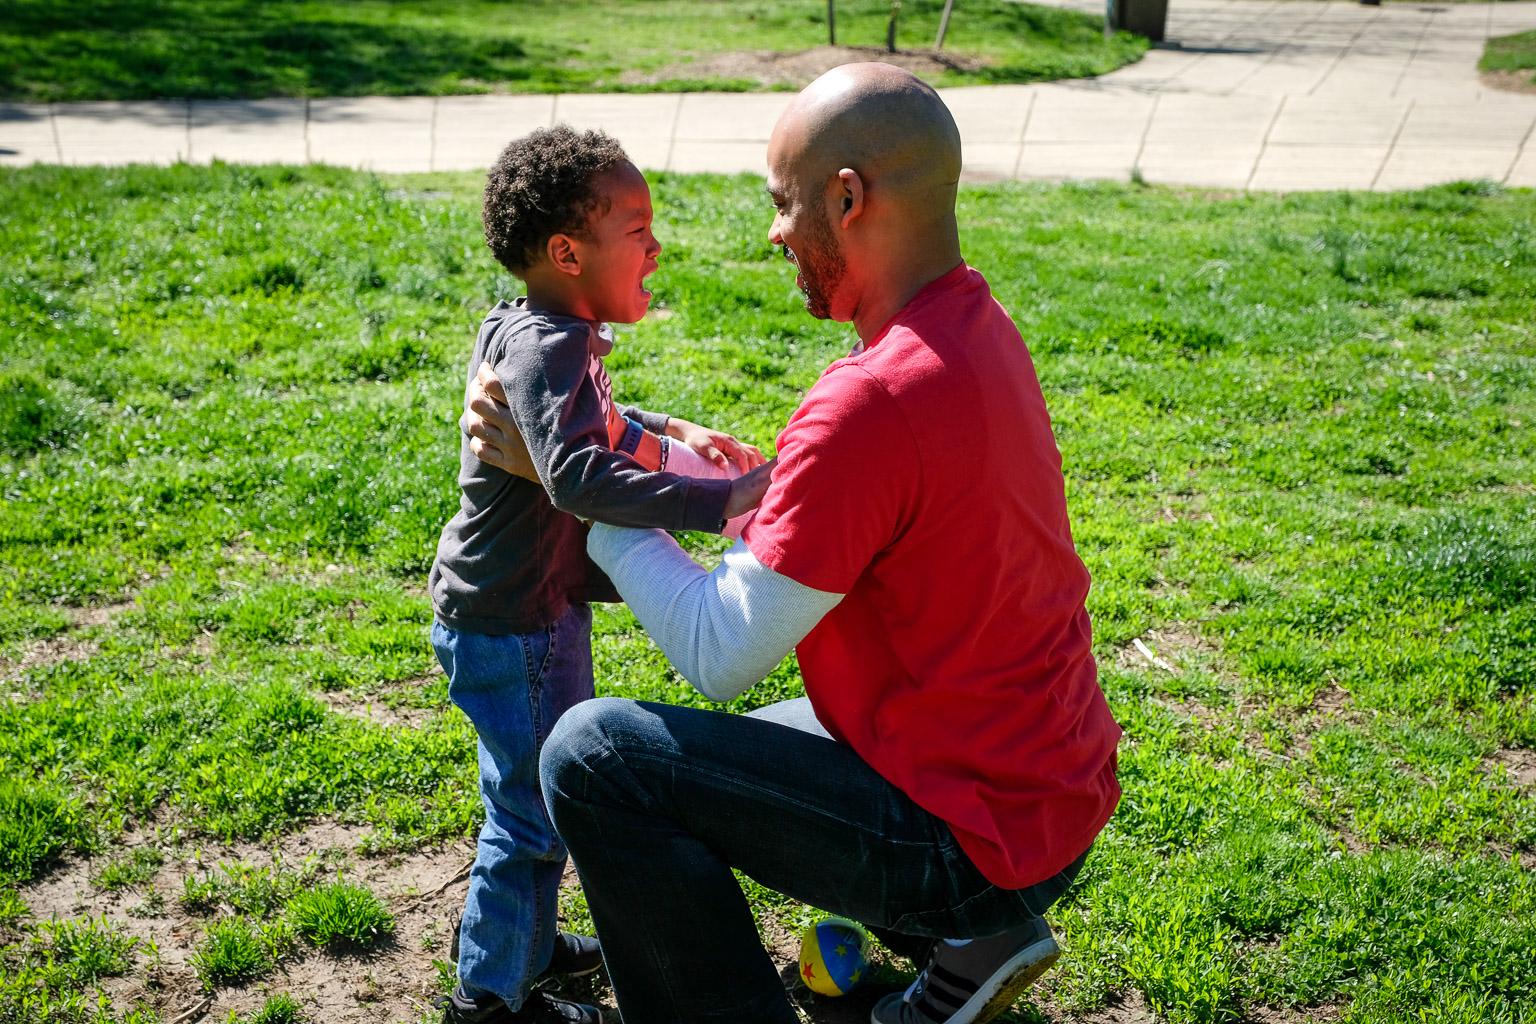 Lenzy_Ruffin_Photography_Family_Portrait_Photographer_Washington_DC__4-8-17-180.jpg